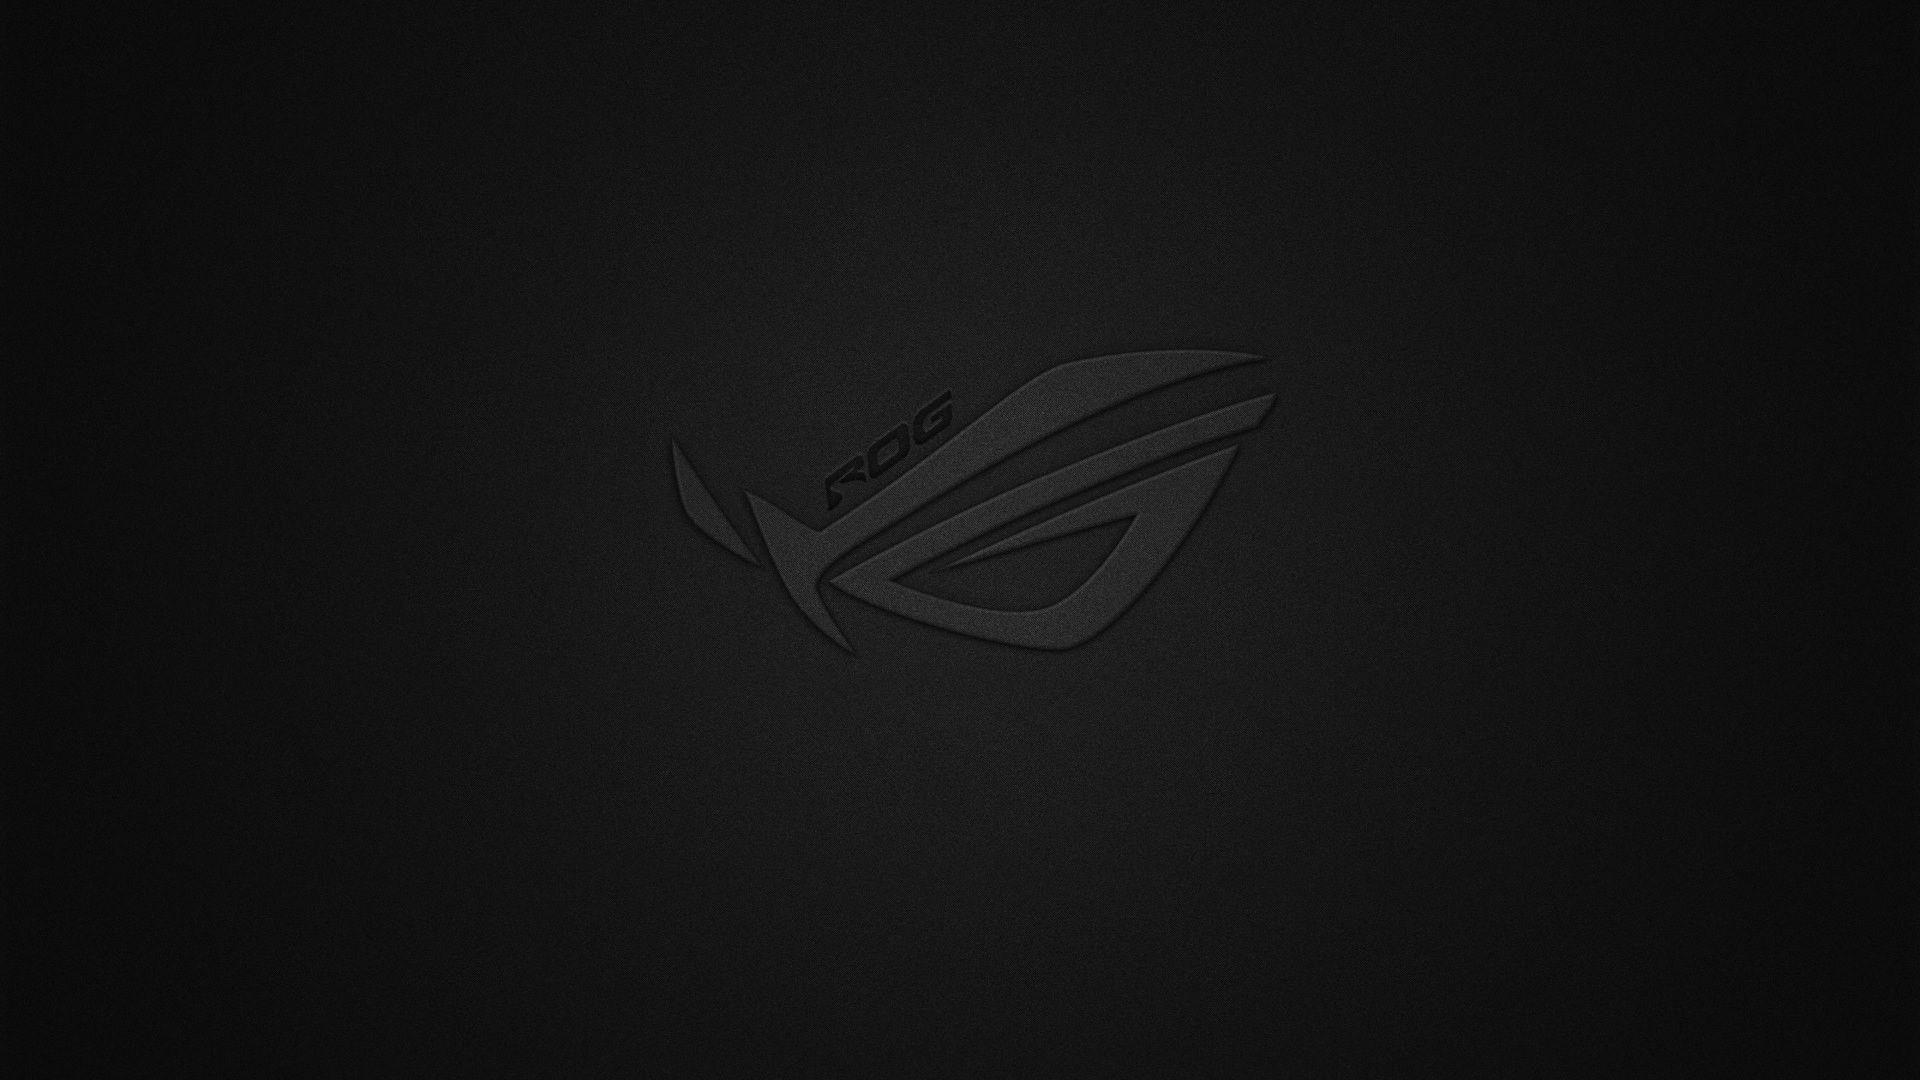 Asus ROG 4K Ultra HD Wallpapers - Top Free Asus ROG 4K Ultra